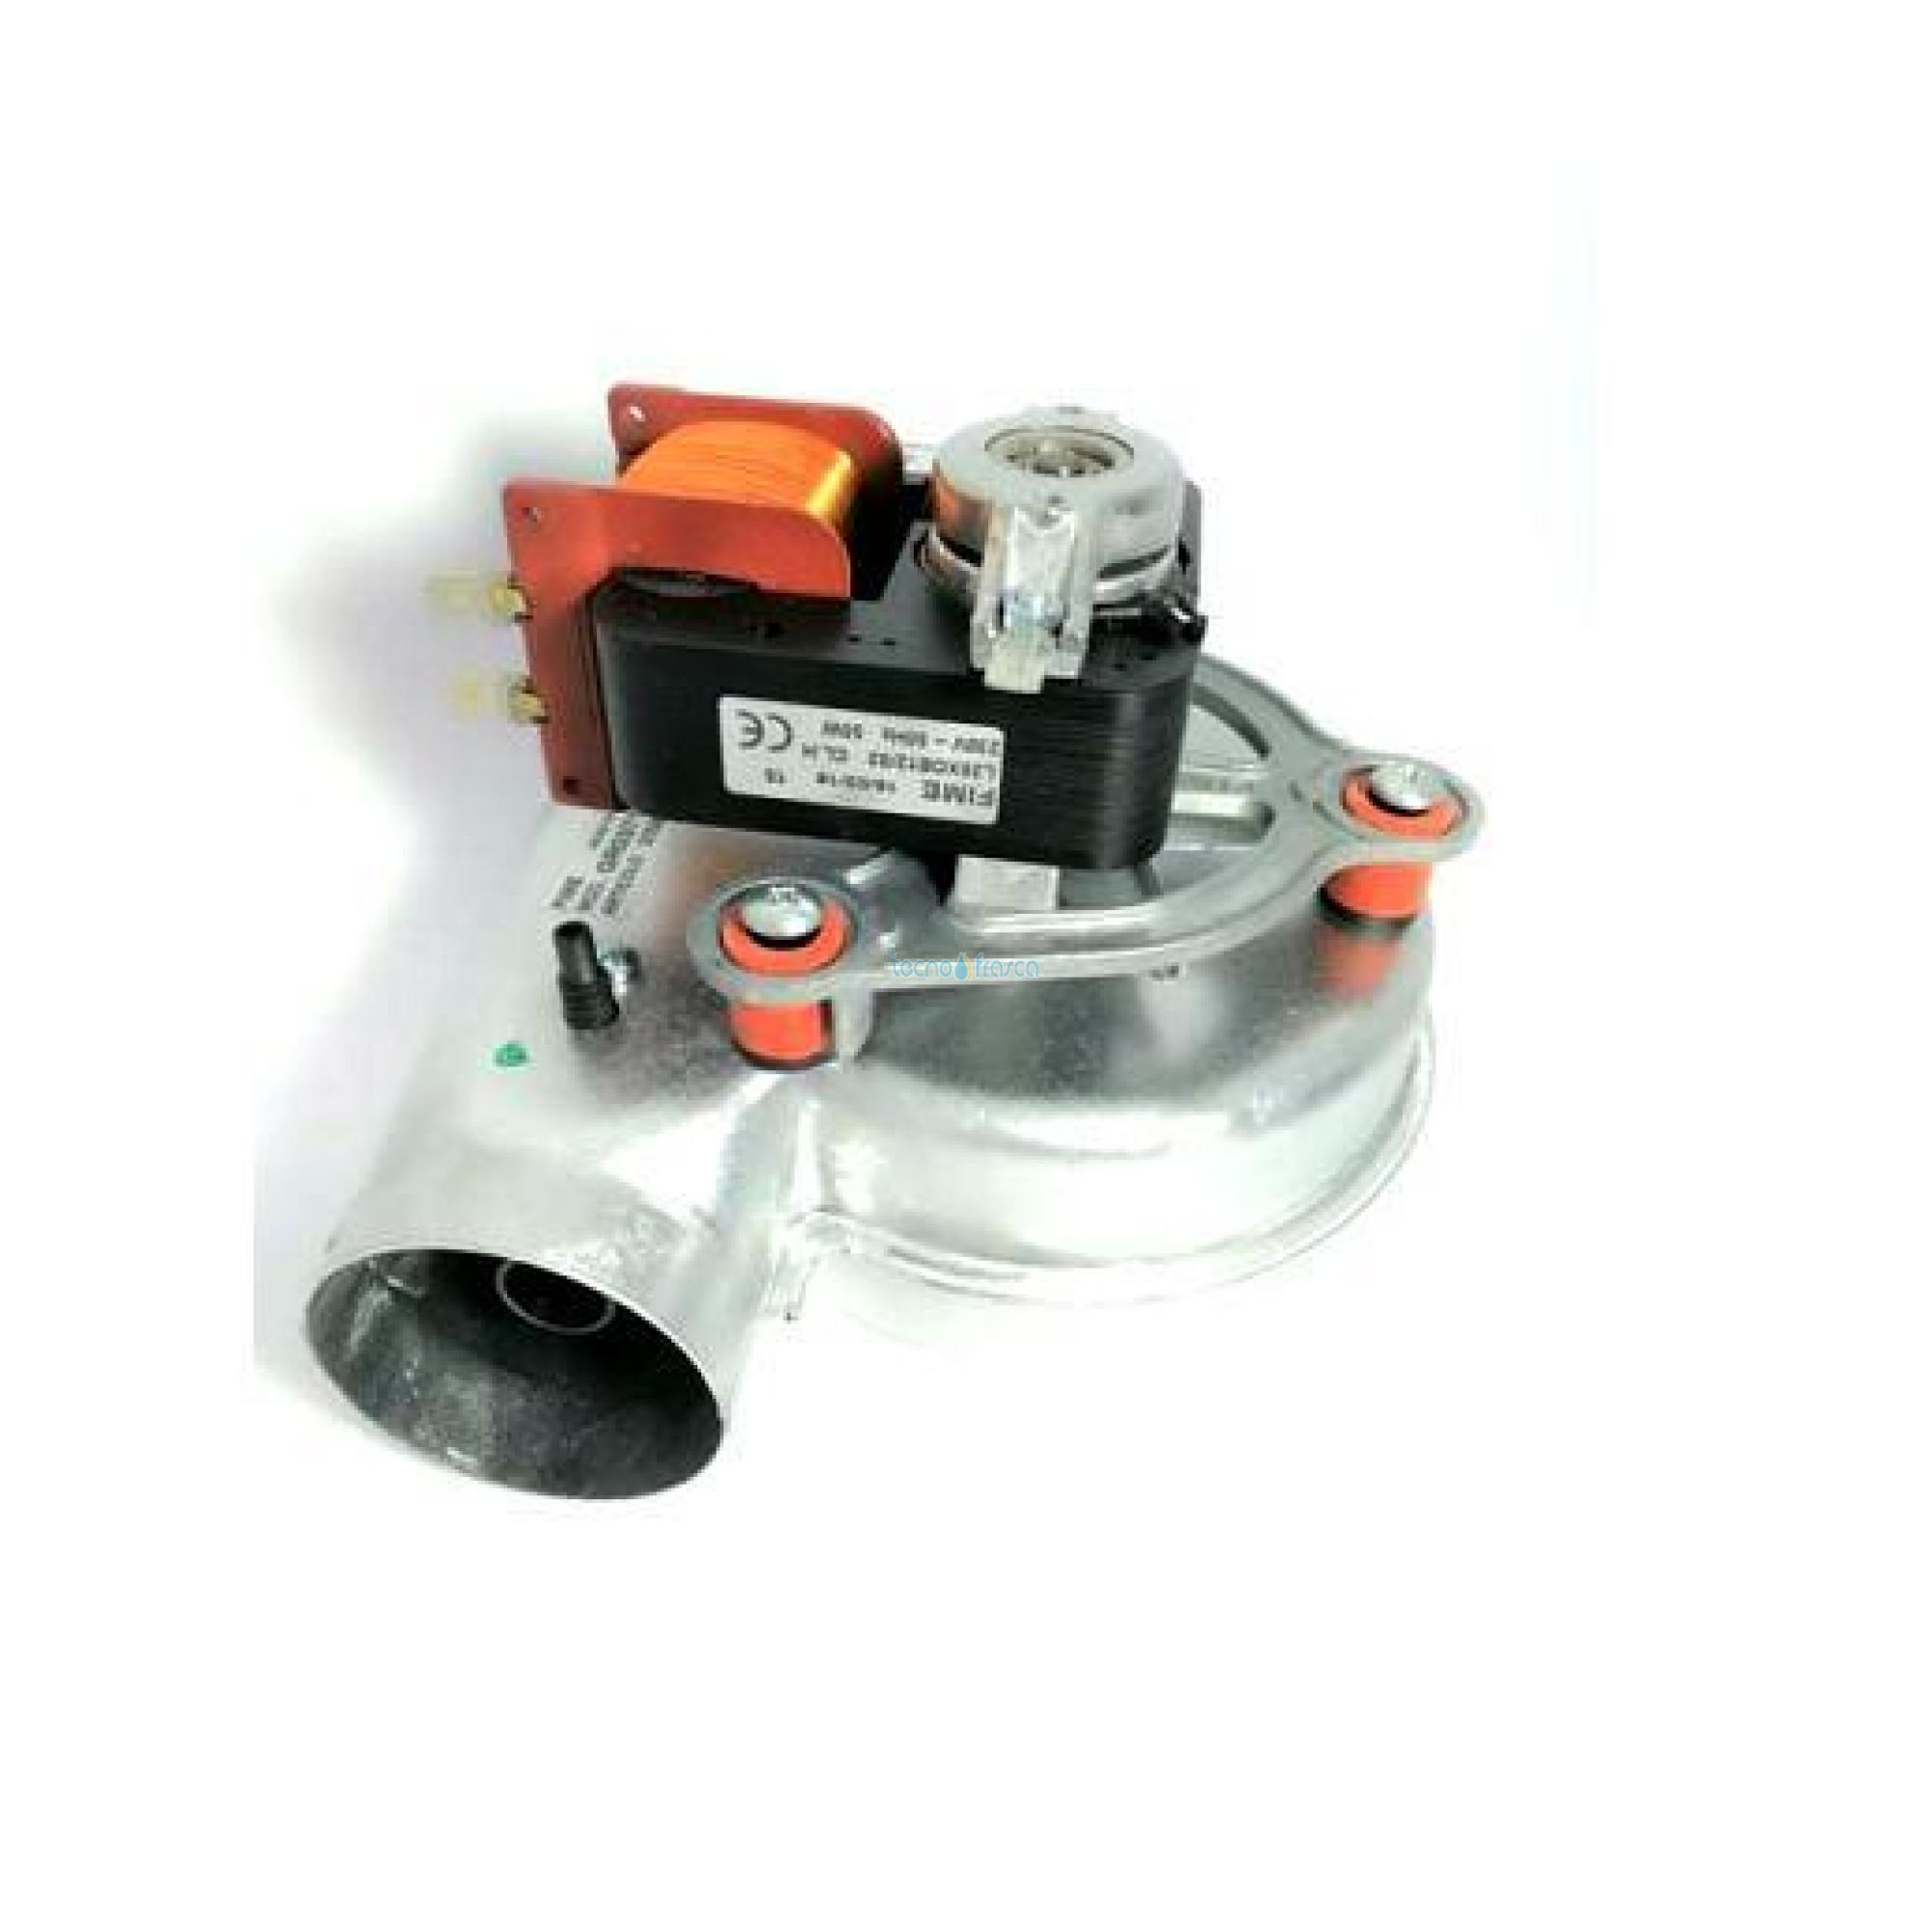 Radiant elettroventilatore 230 es30-8 gr03710 37029la